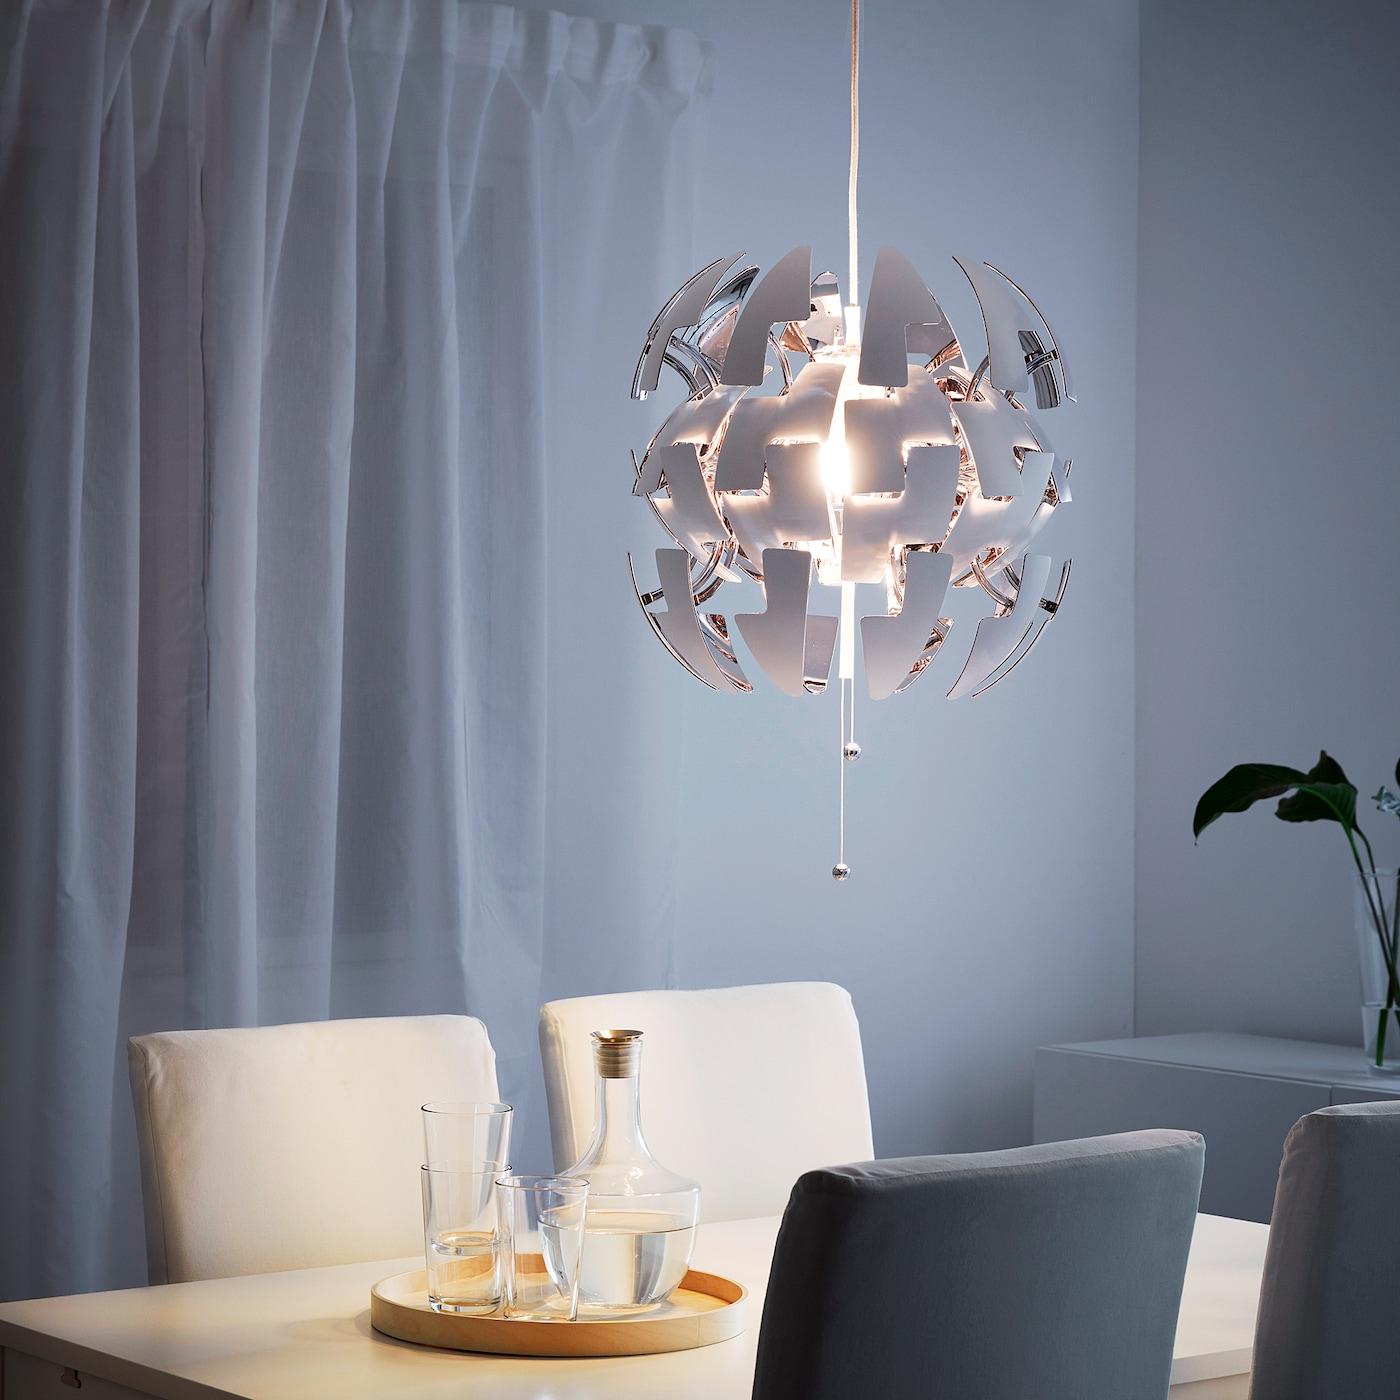 Ikea Ps 2014 Pendant Lamp White Silver Colour 35 Cm Ikea